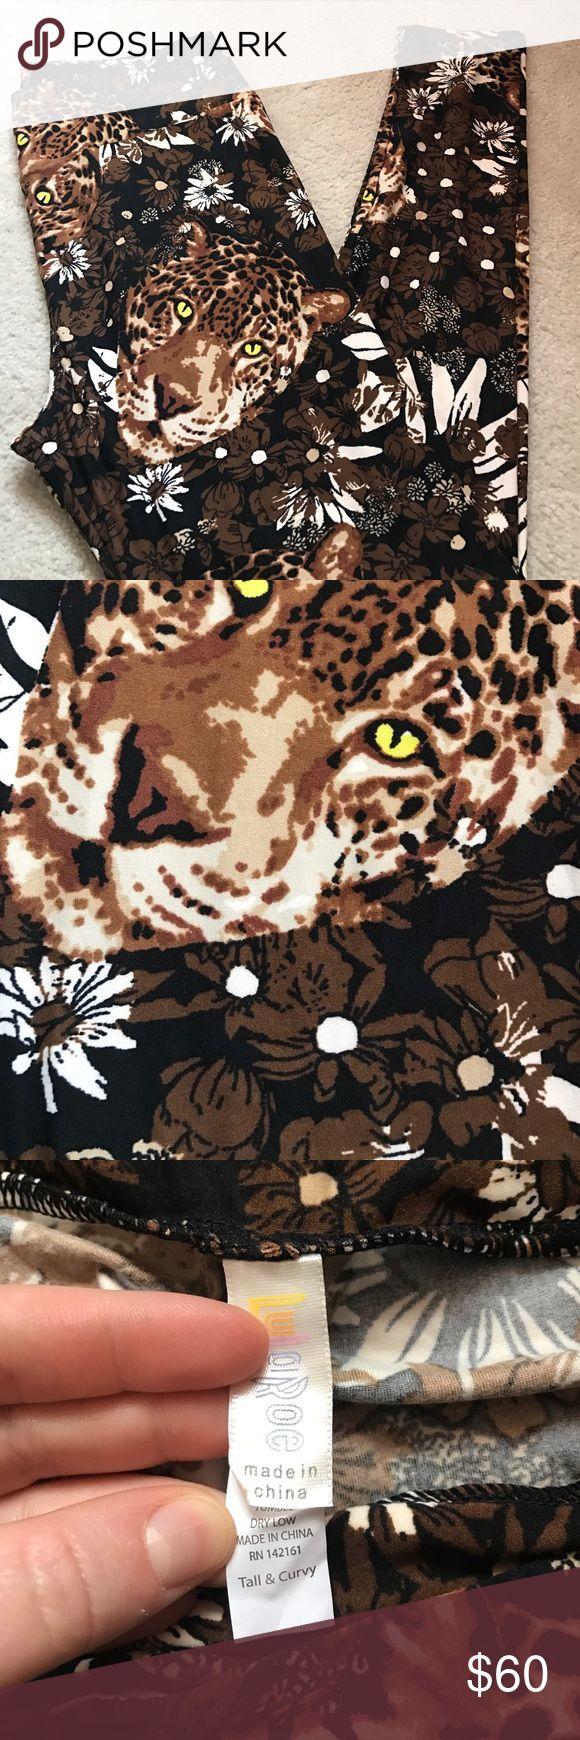 NWOT LuLaRoe Tall & Curvy Cheetah Leggings NWOT LuLaRoe Tall & Curvy Leggings (fits sizes 12-22) LuLaRoe Pants Leggings